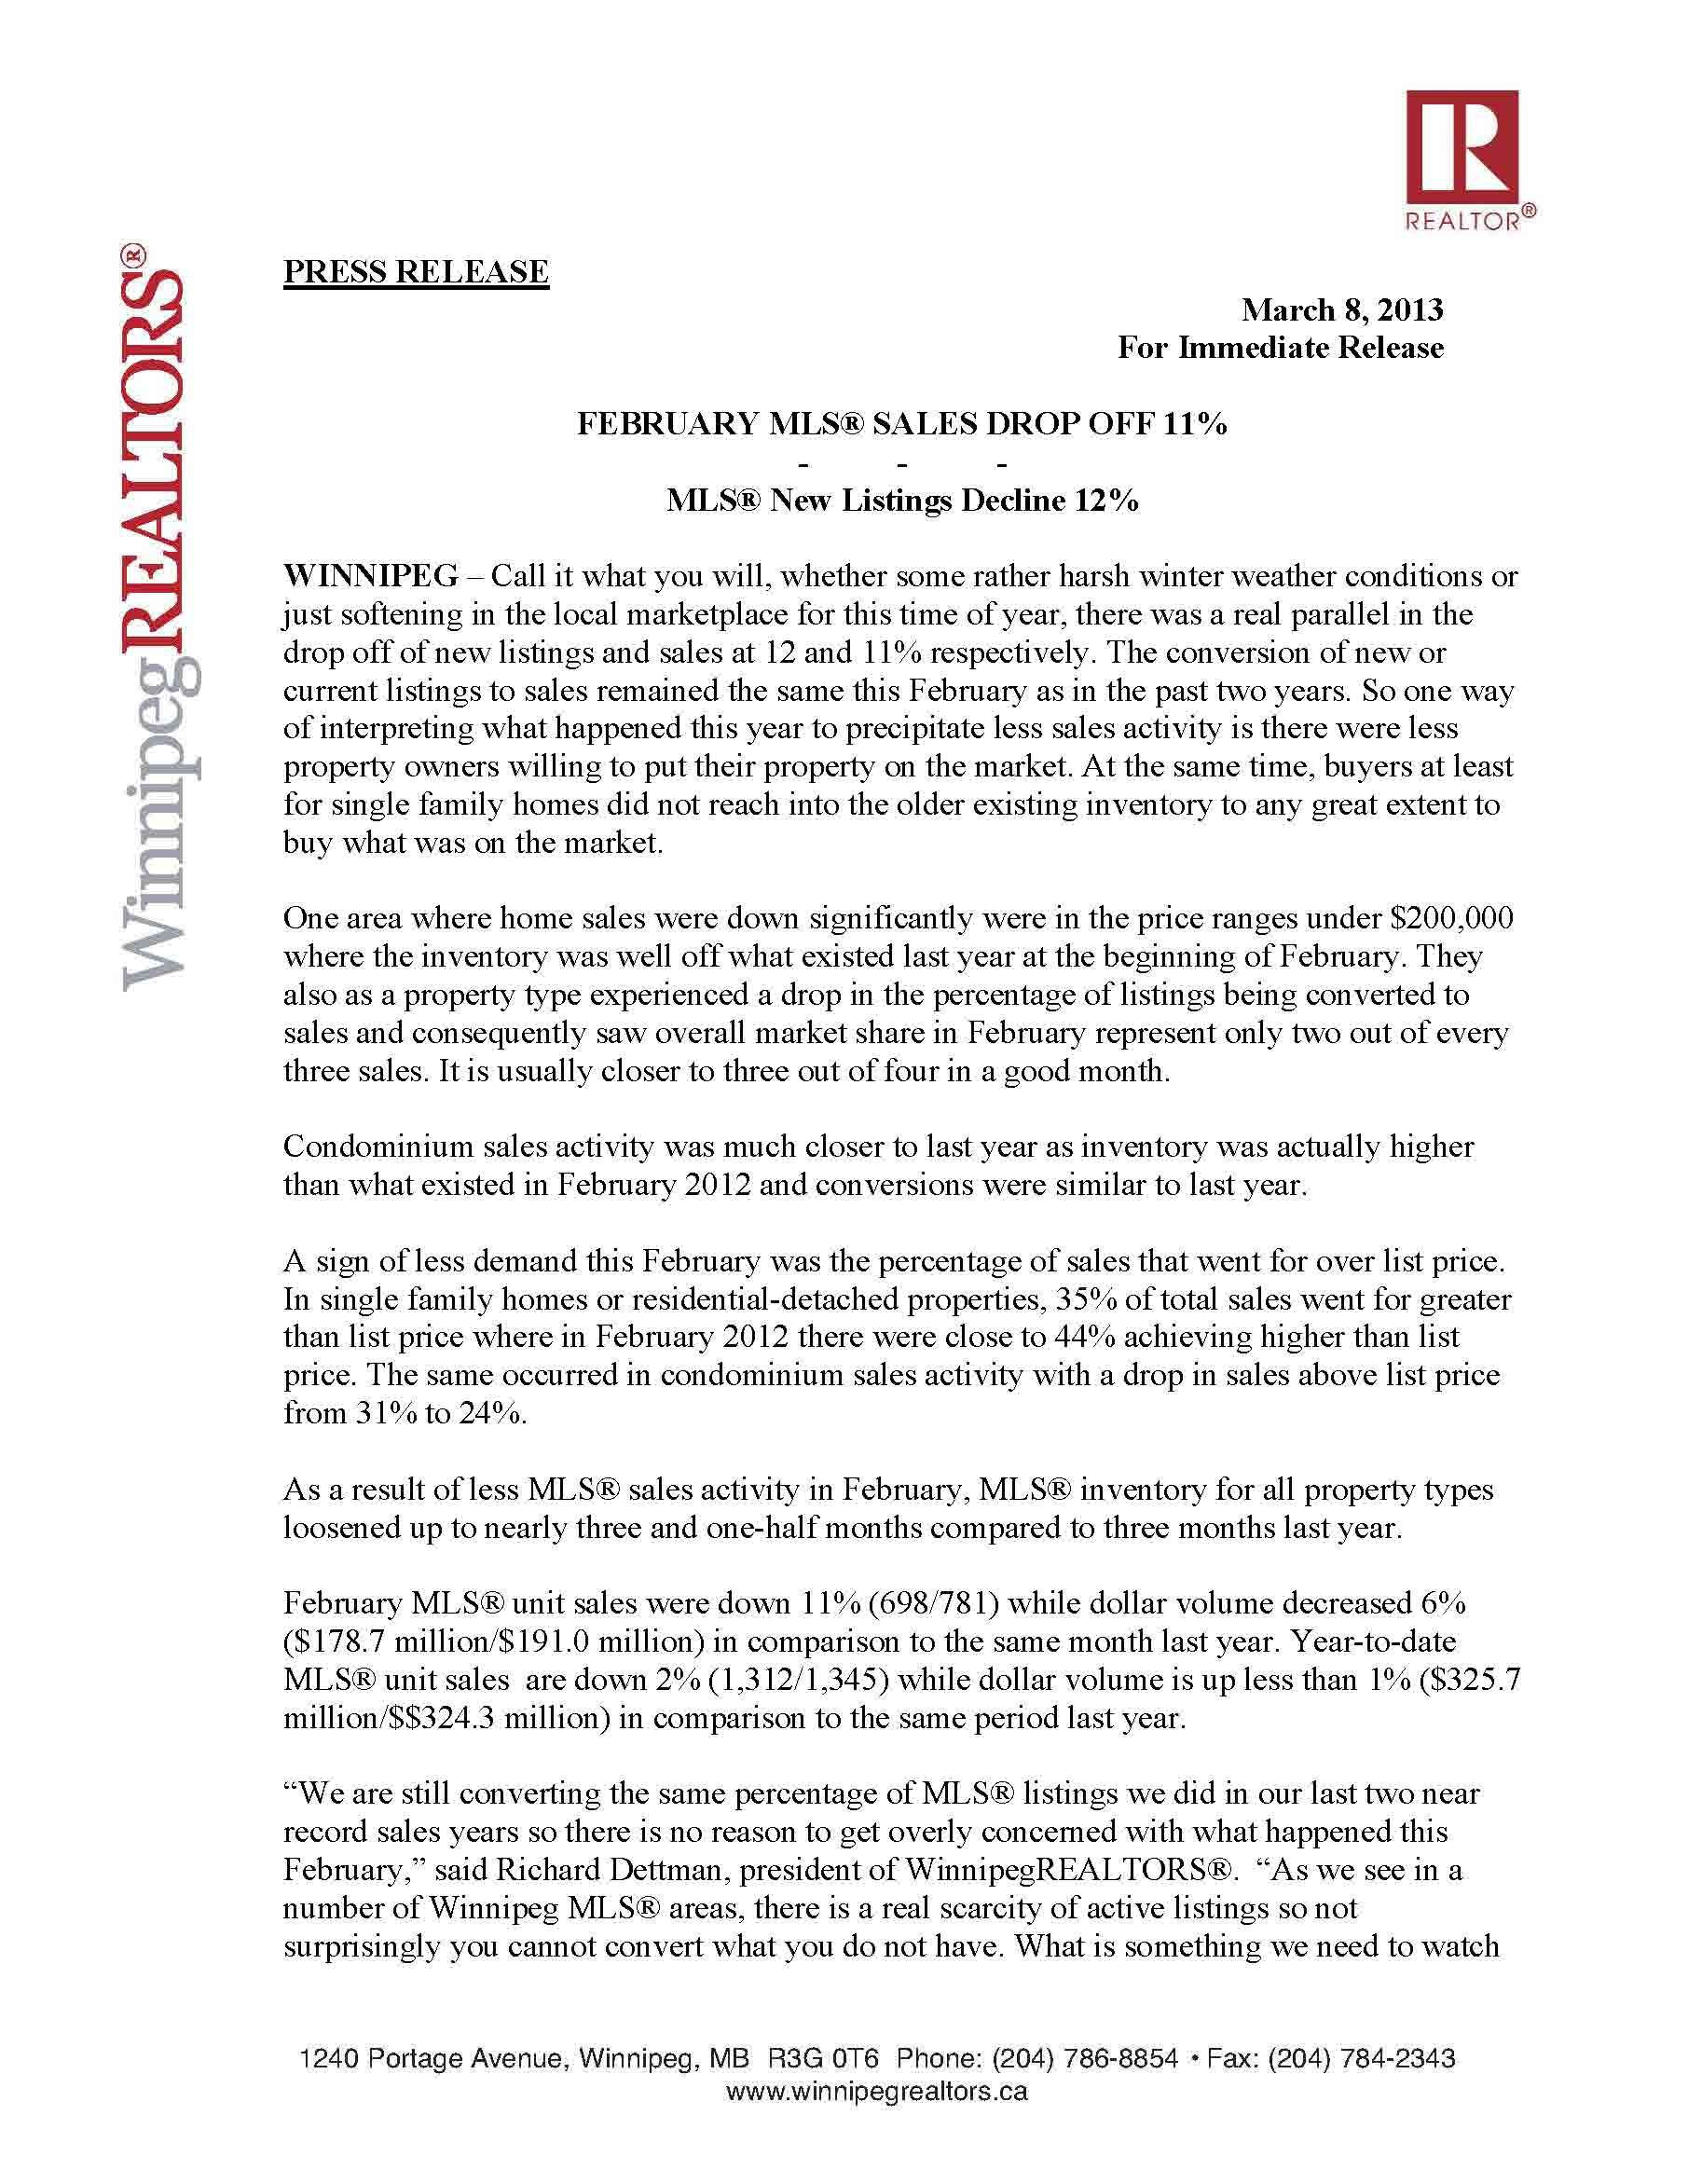 Winnipeg REALTORS® Press Release:  February MLS® Sale Drop Off 11%  http://v2.estatevue.com/platform/kelowna/freisguys/blog.html